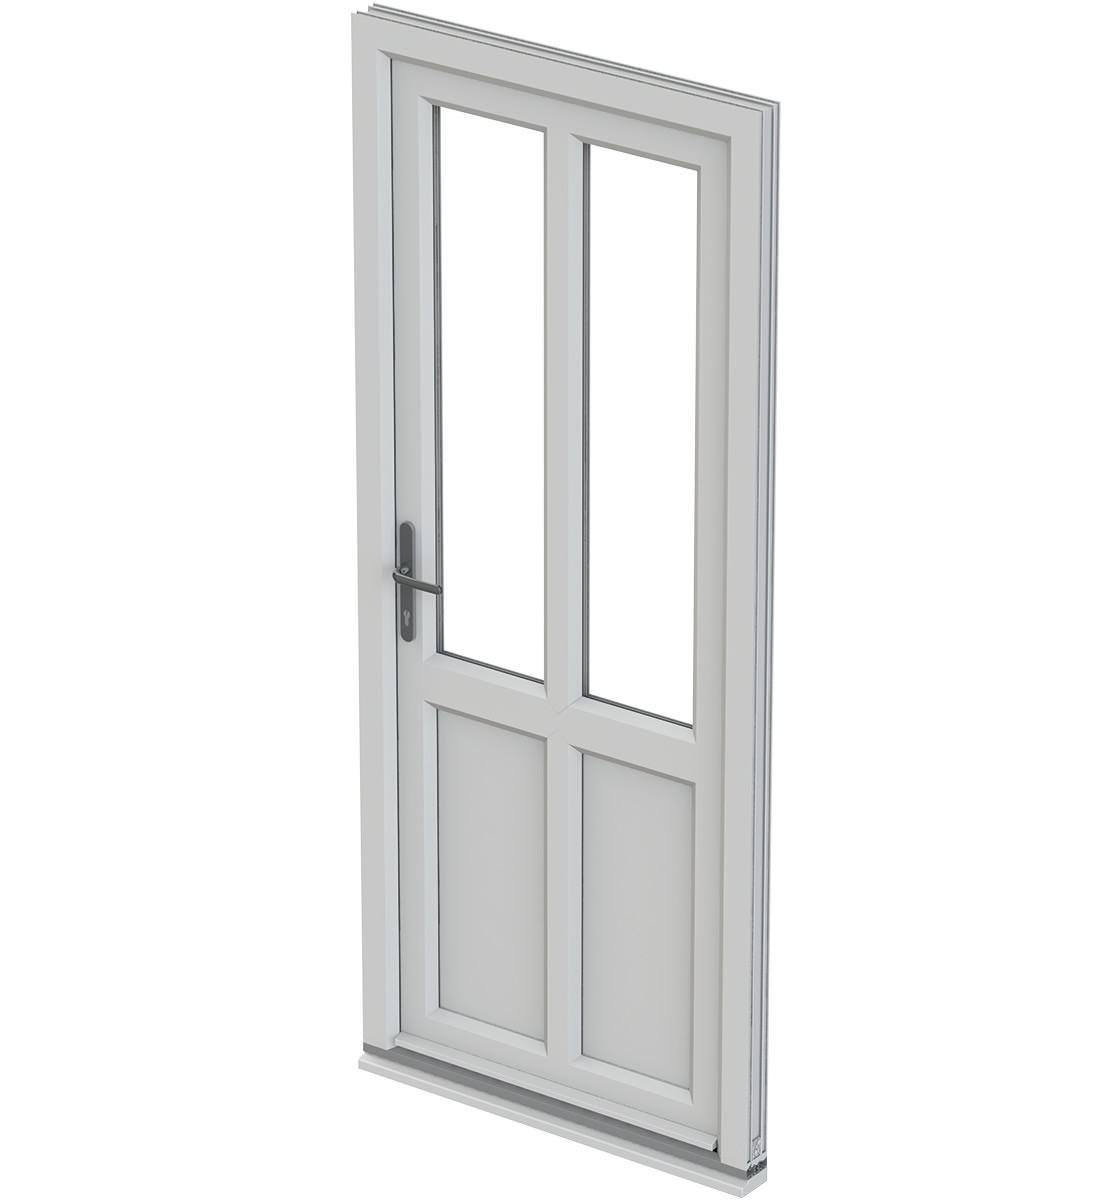 supply only uPVC doors near me swindon